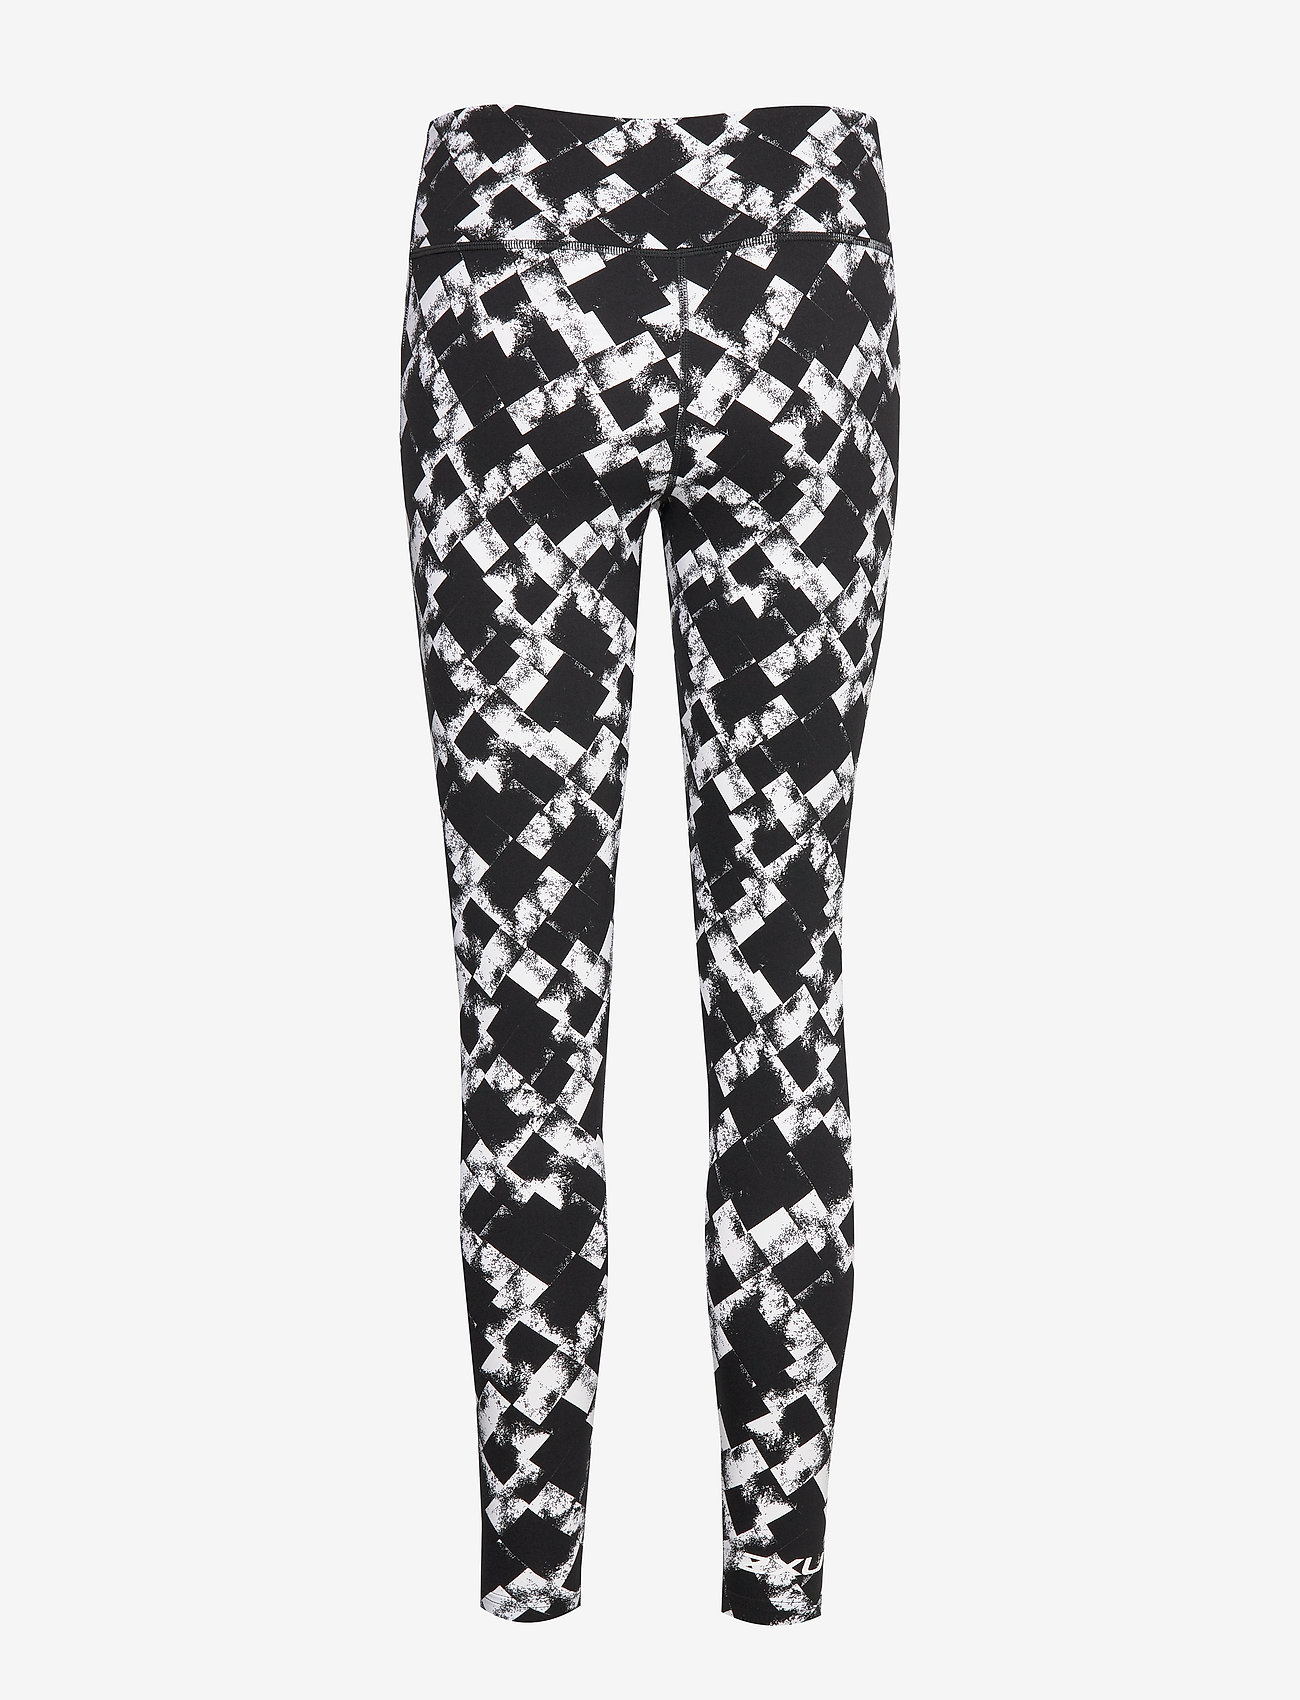 Printfitnmidrisecomp Tights-w (Textured Check Black/white) - 2XU 89jlu0